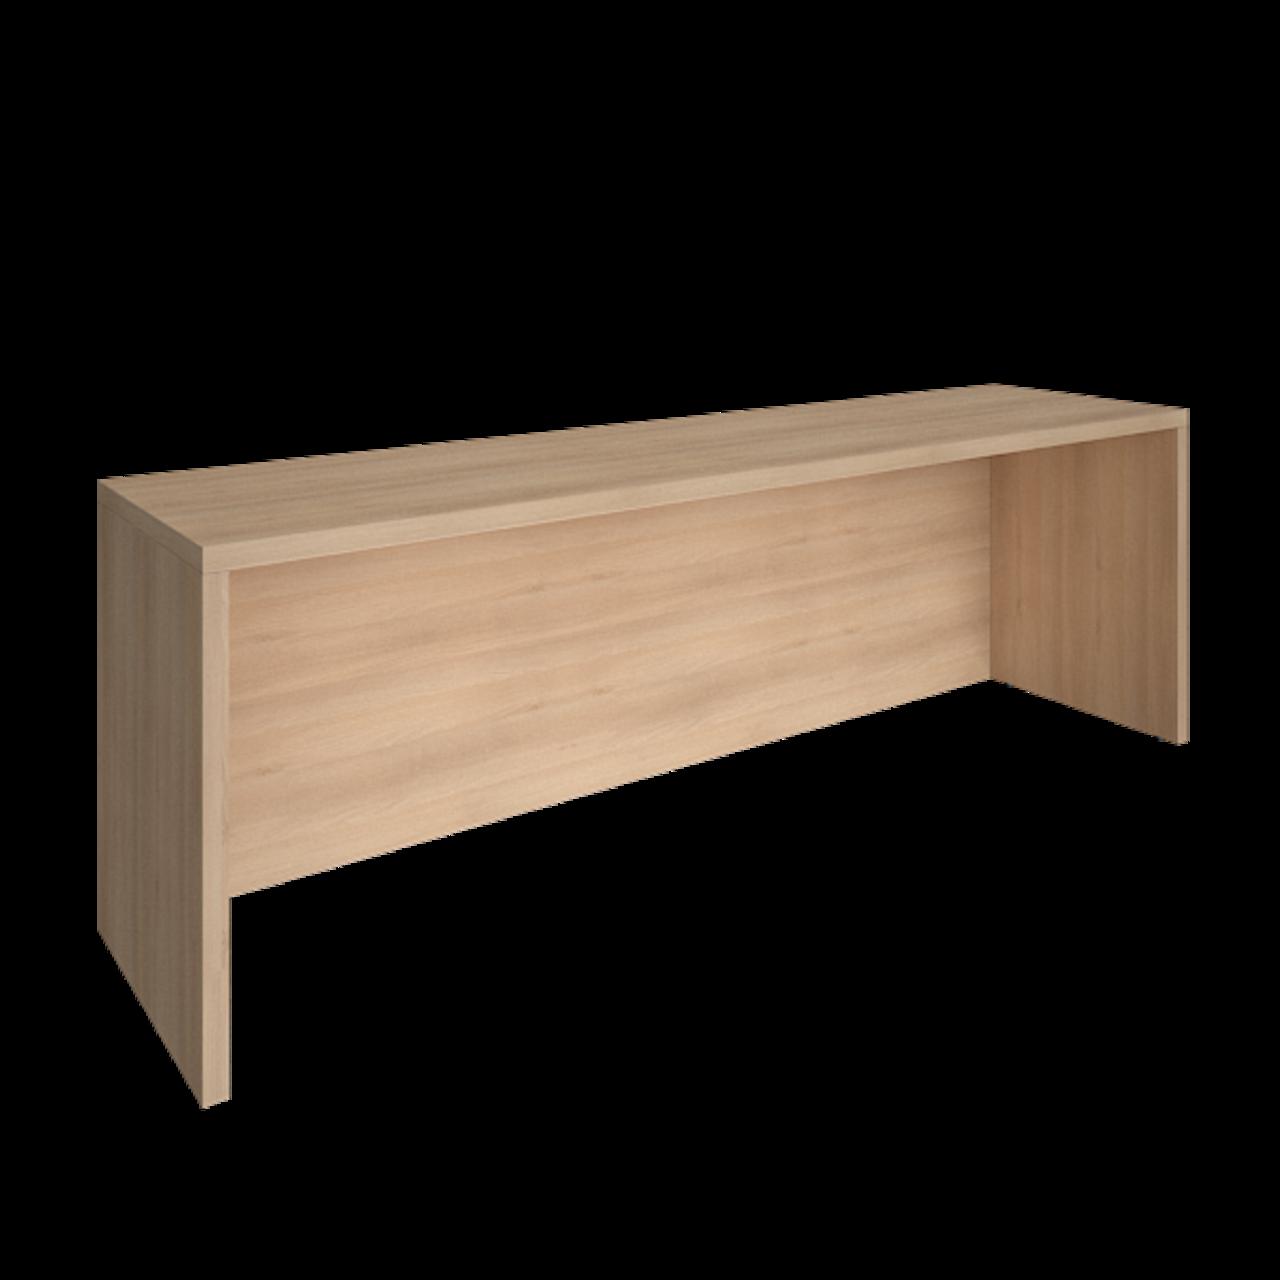 Пристенный стол - фото 1